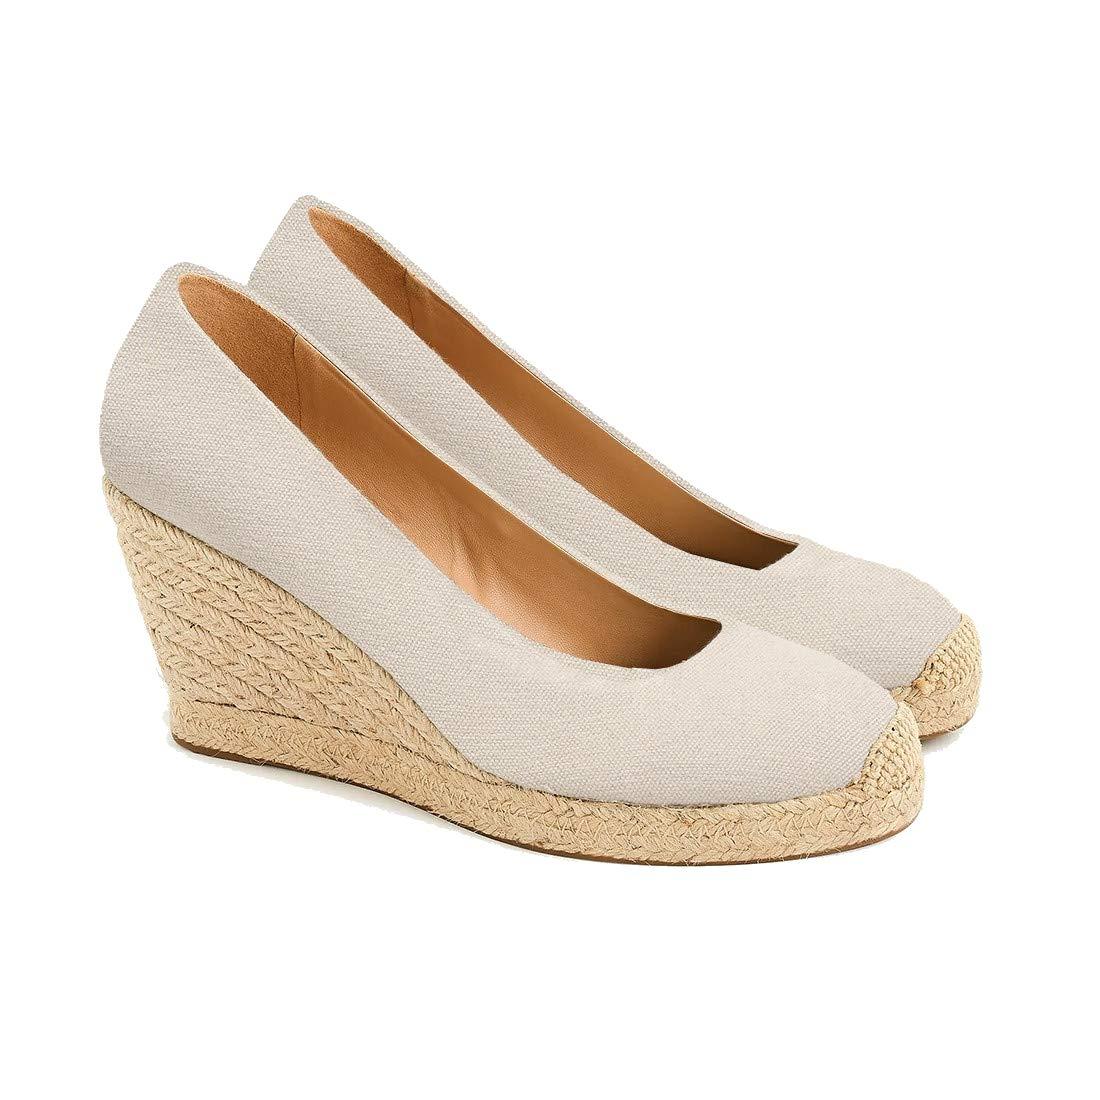 a591b61a904 Amazon.com | Womens Closed Toe Espadrille Wedges Shoes Heels Pumps ...